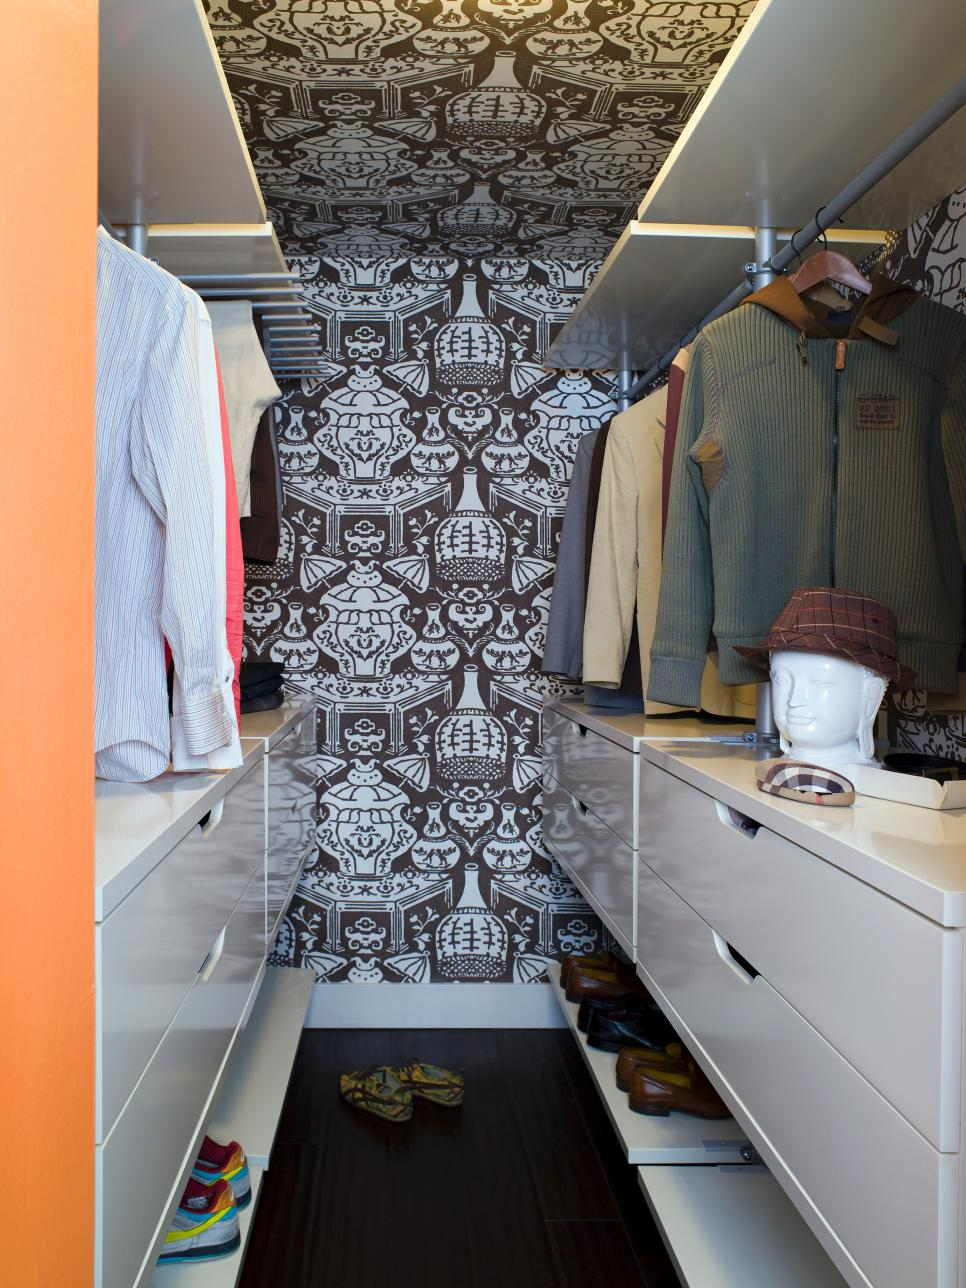 Um-belo-papel-de-parede дизайнерских идей 10 дизайнерских идей, которые наверняка улучшат качество Вашей жизни Um belo papel de parede